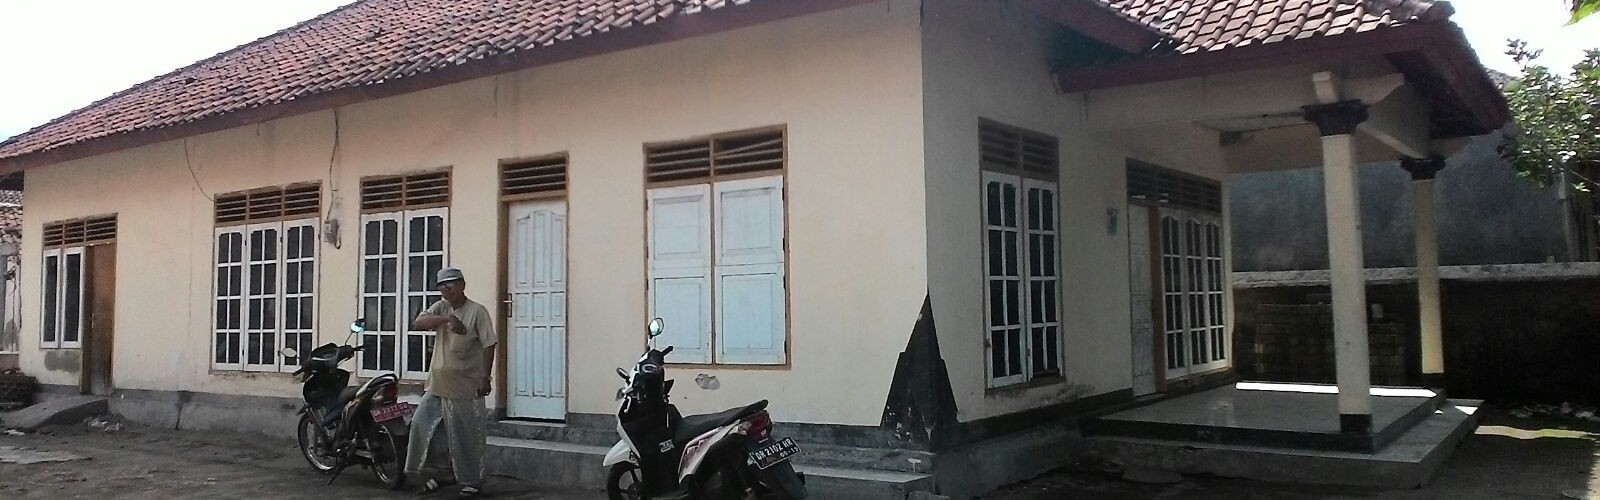 Rumah Pak Mas'un.